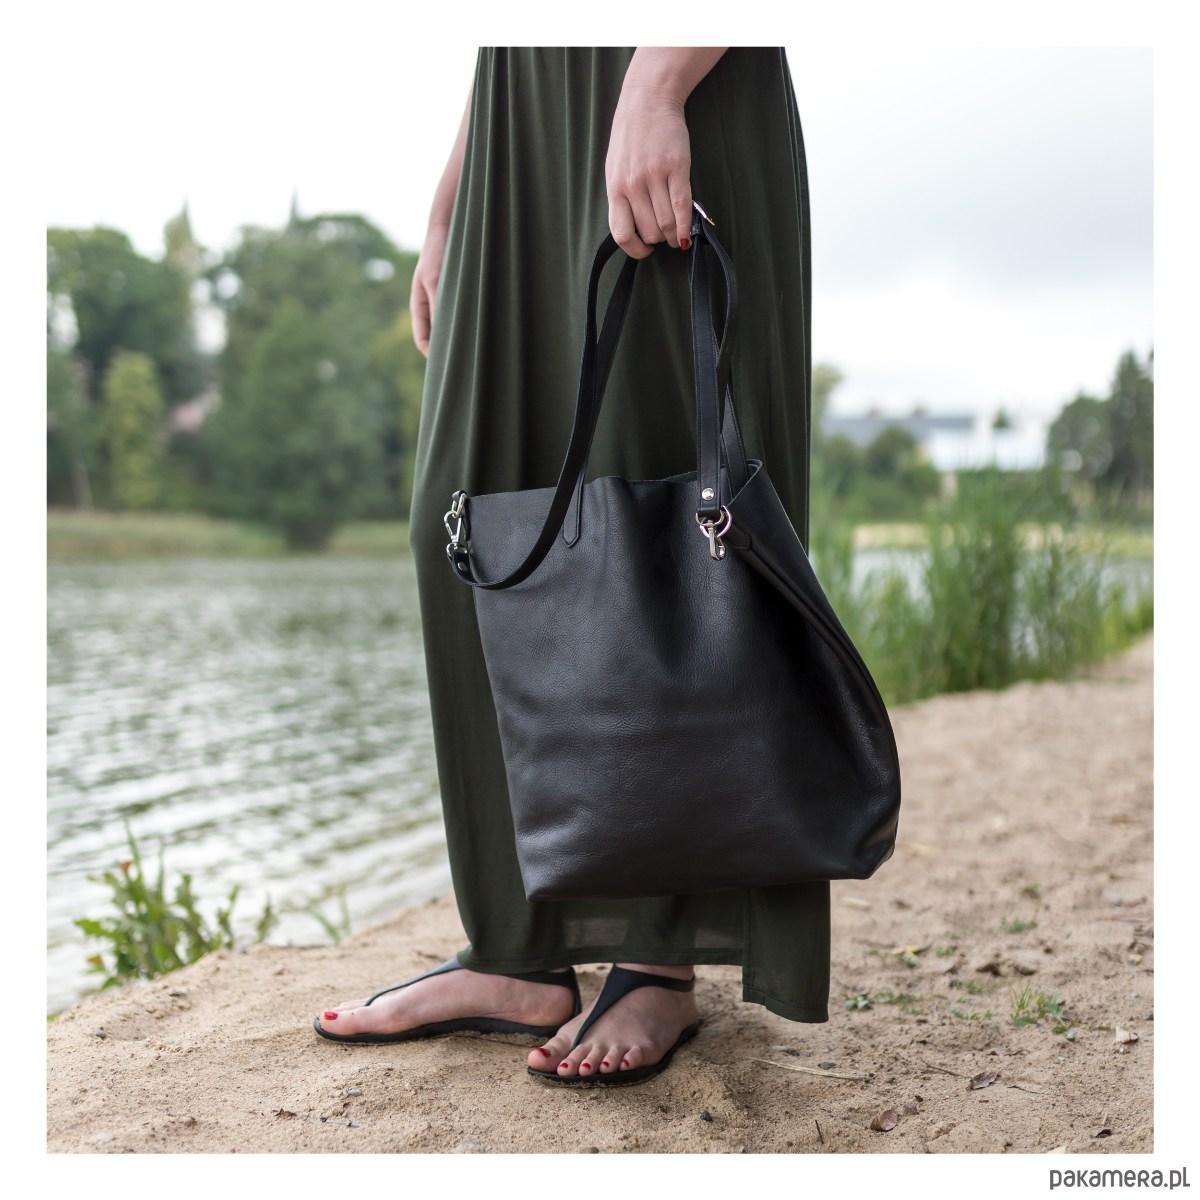 2088665a37a22 Sofija - duża skórzana torba z długim paskiem - torby na ramię - damskie -  Pakamera.pl